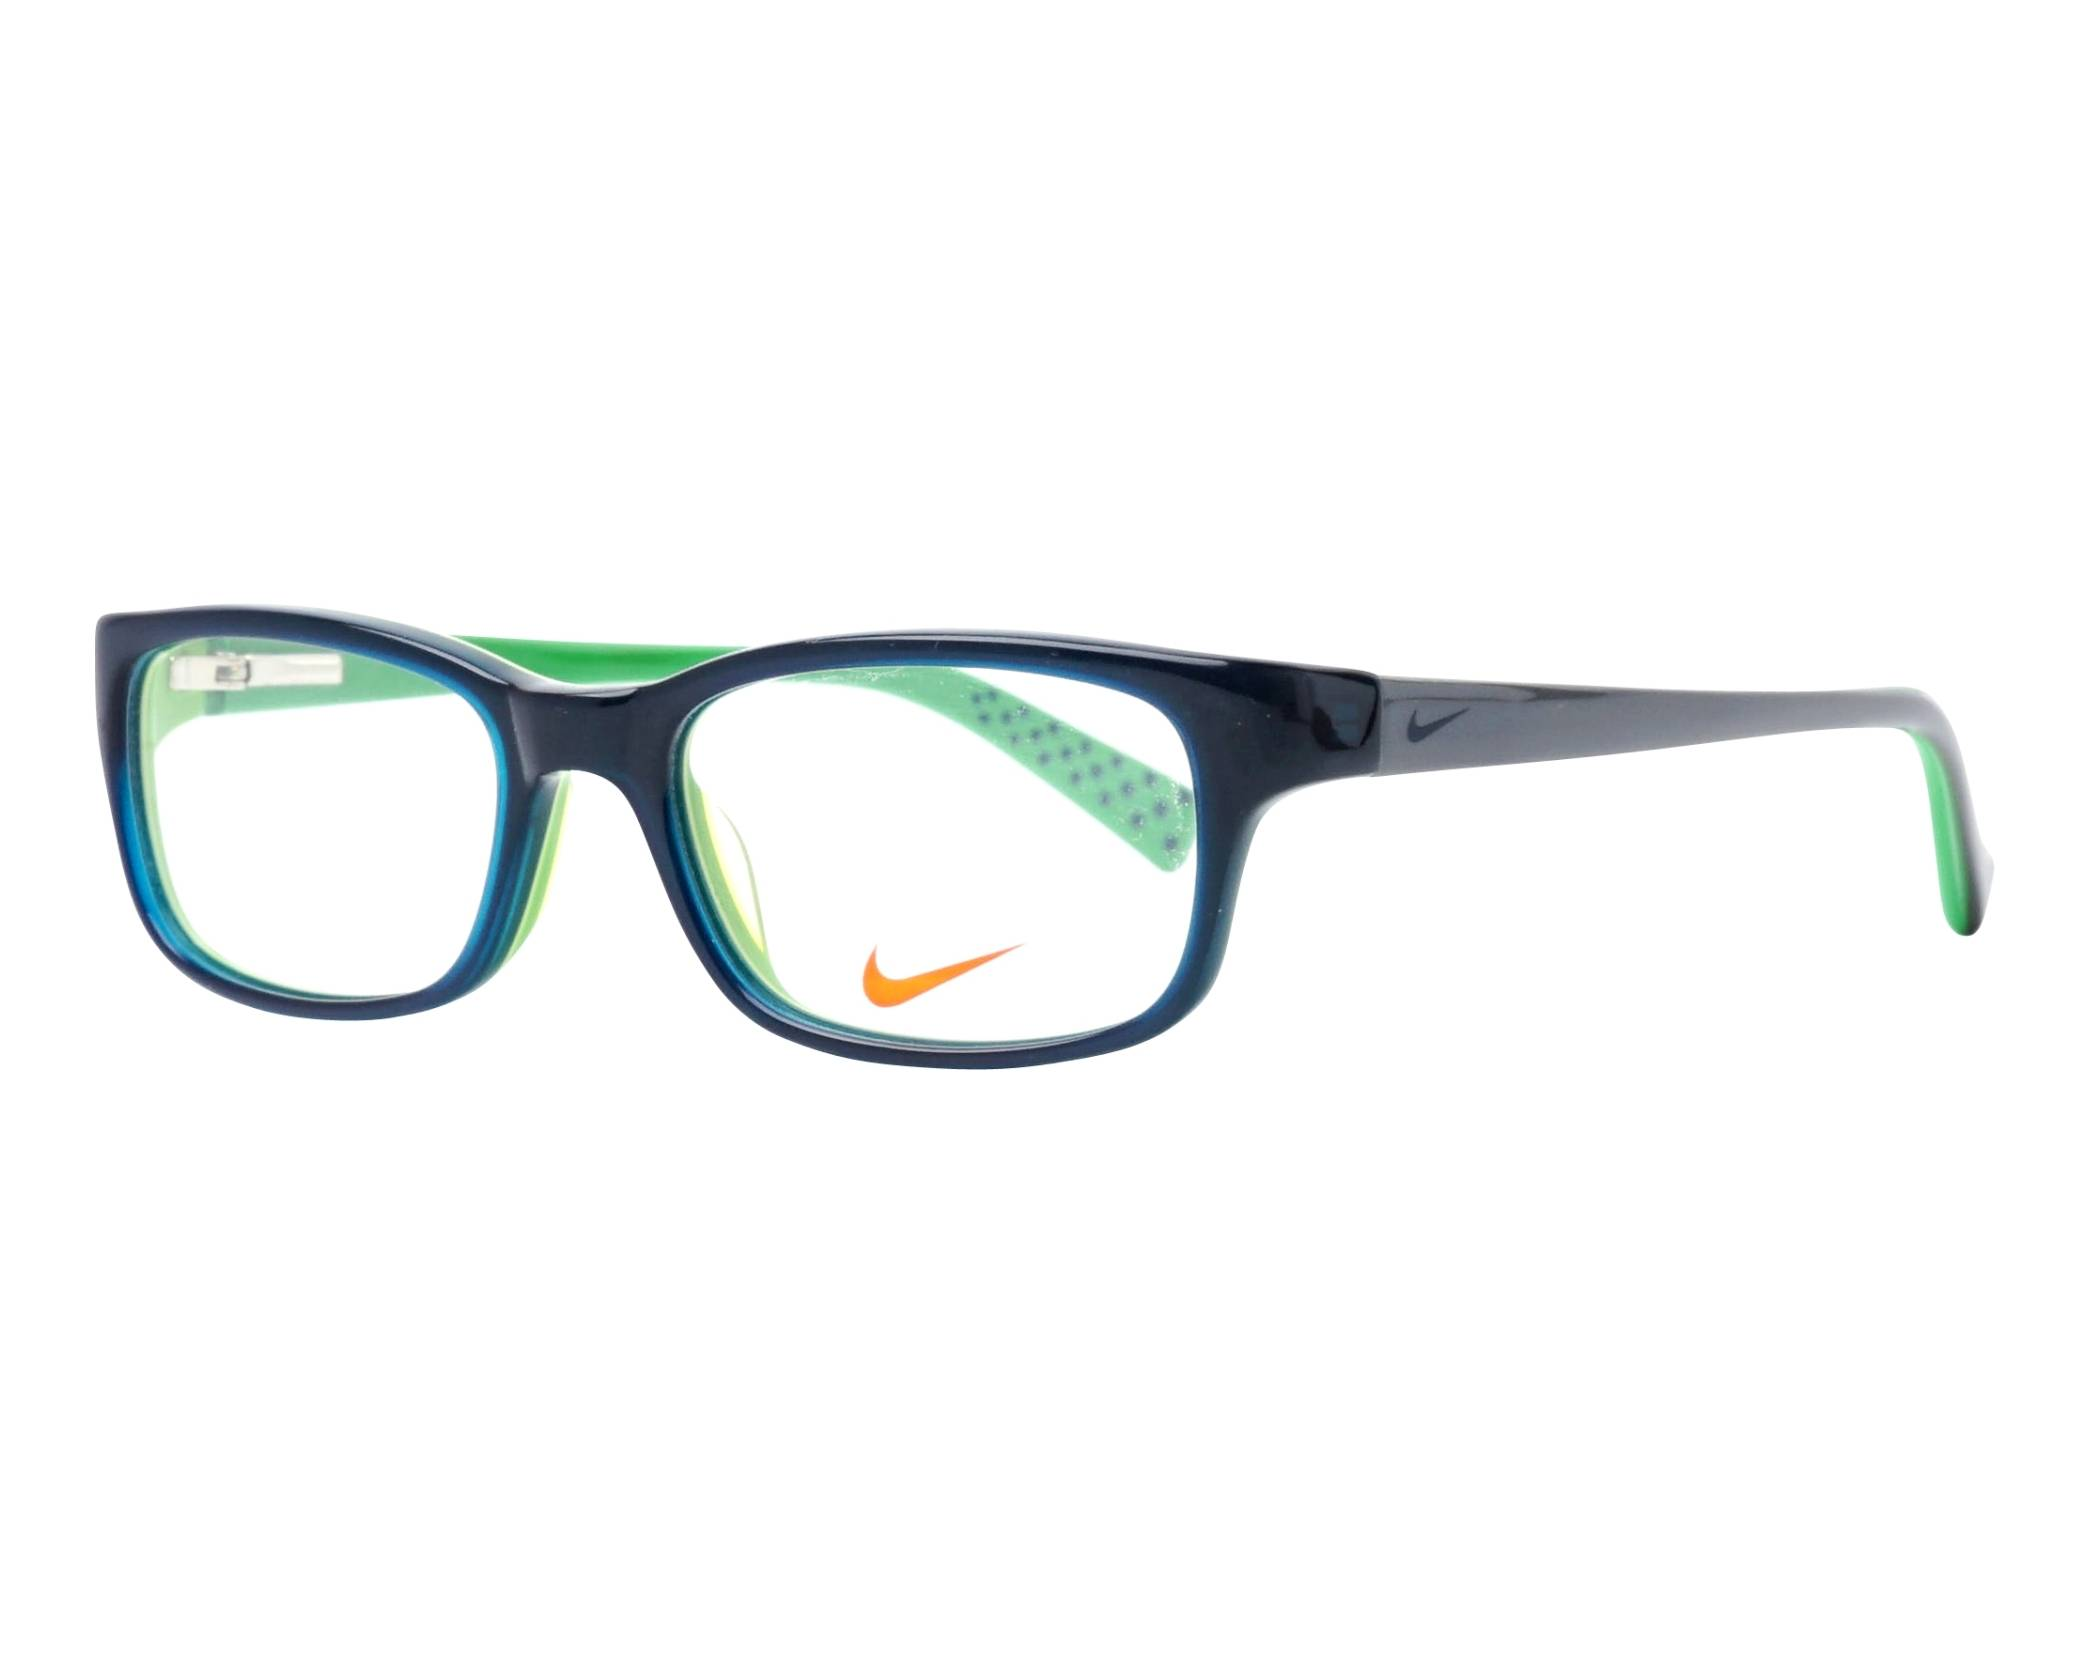 26e07f89e5a6 eyeglasses Nike 5513 325 47-16 Blue Green profile view